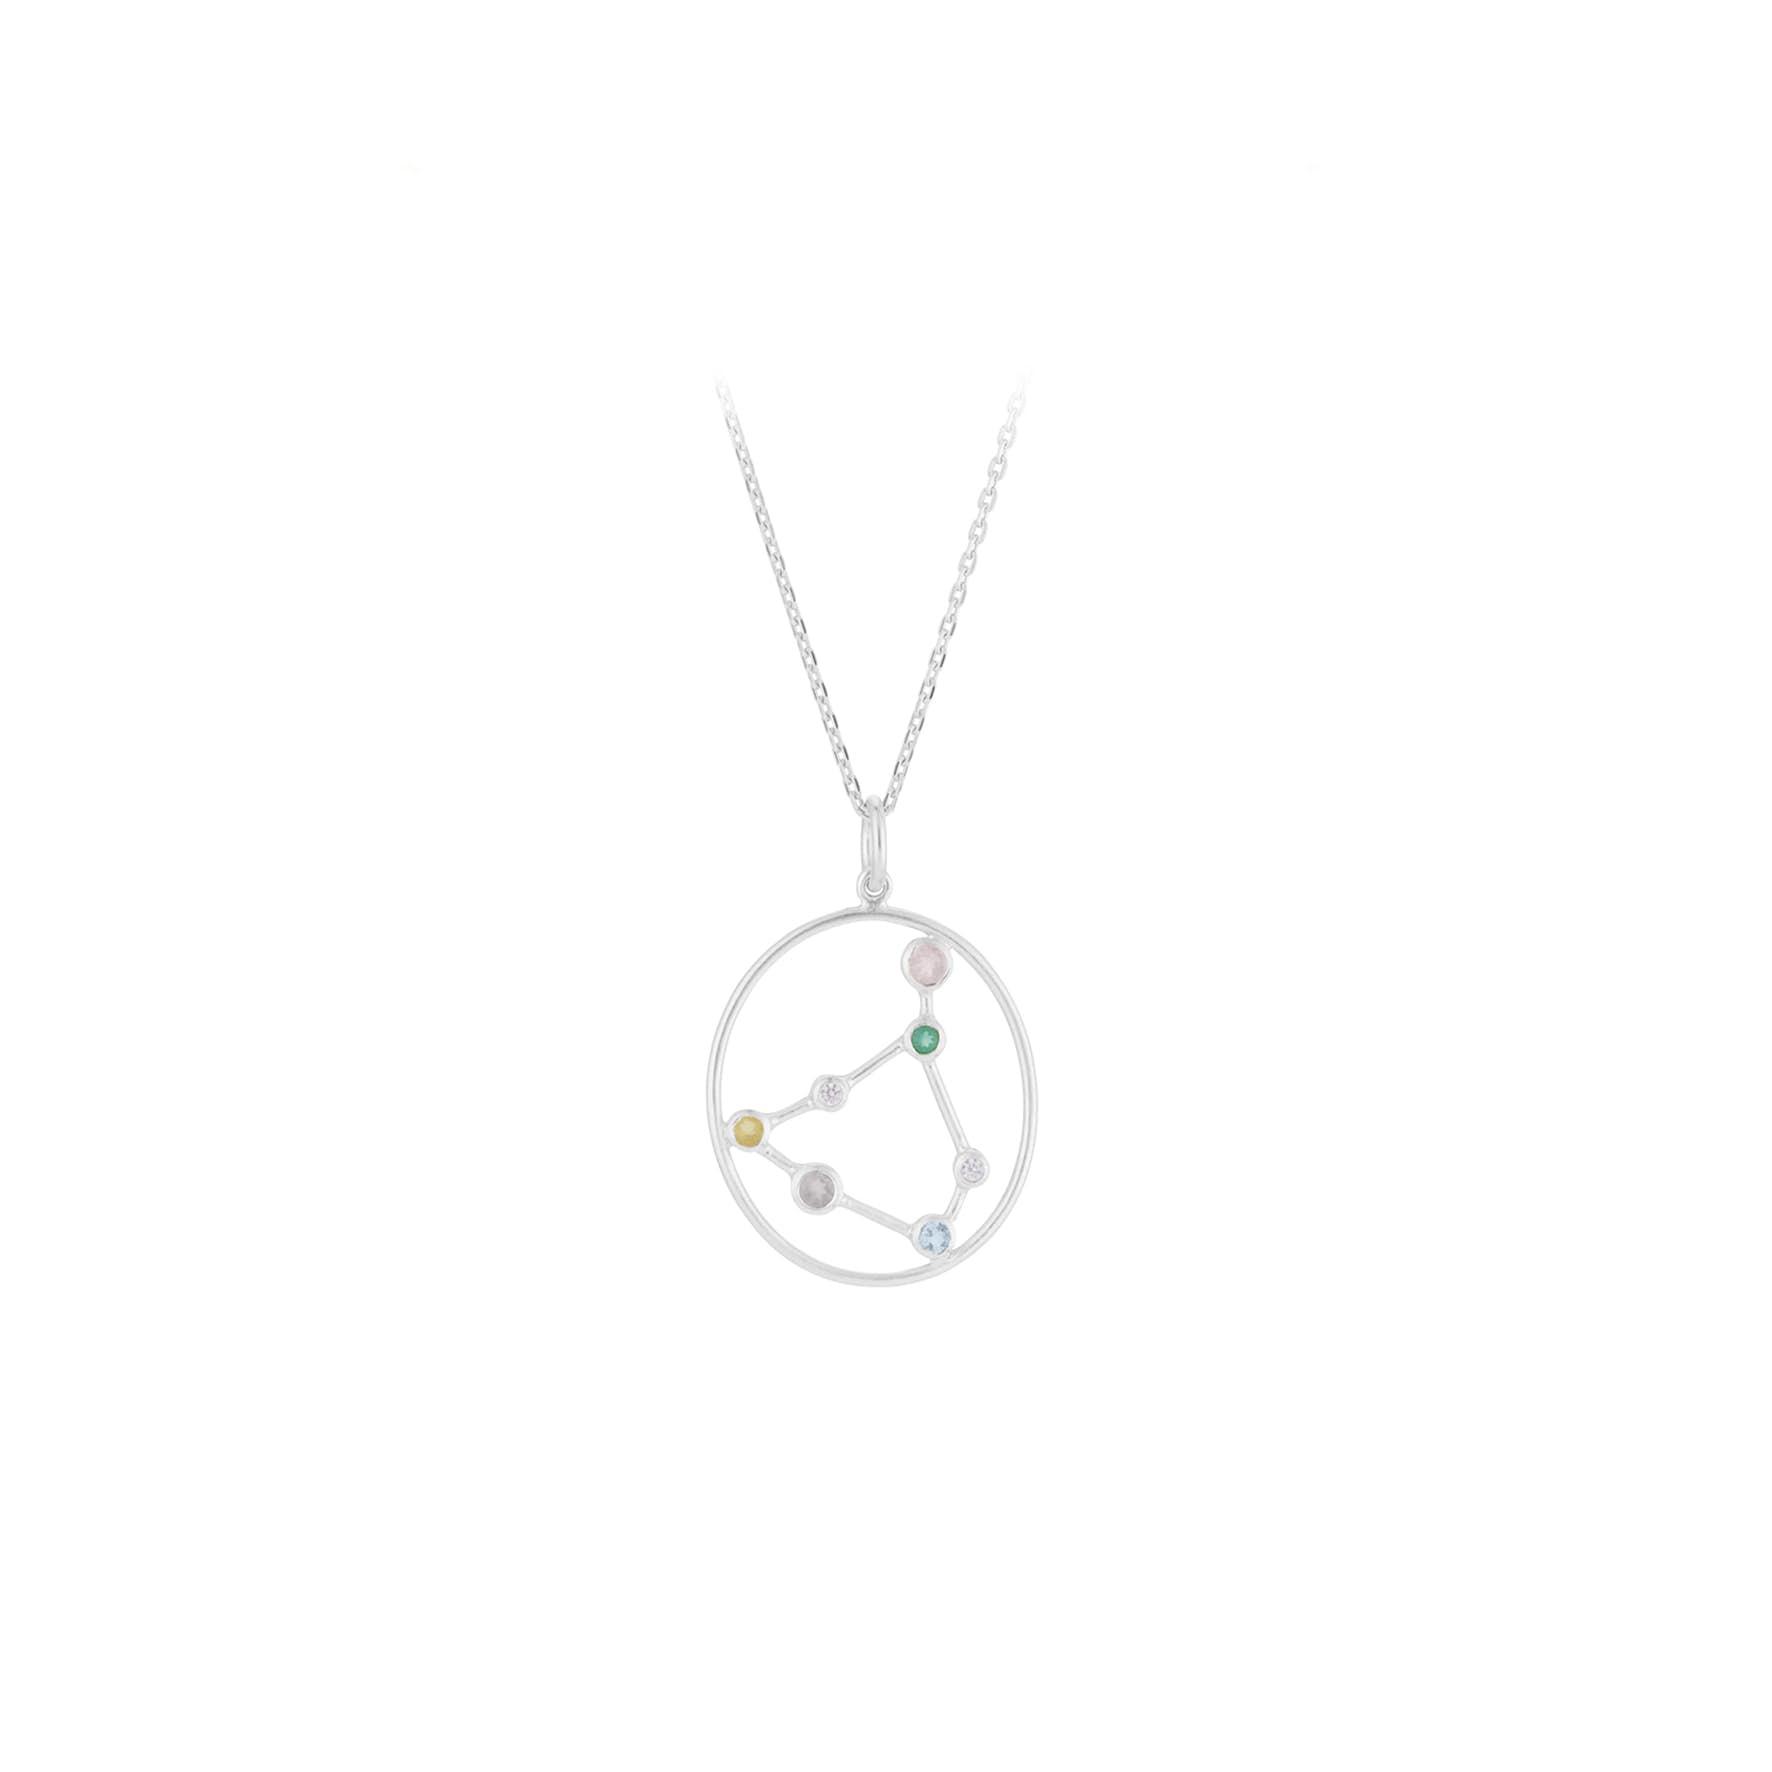 Zodiac Capricorn Necklace (Dec 22 - Jan 19) von Pernille Corydon in Silber Sterling 925